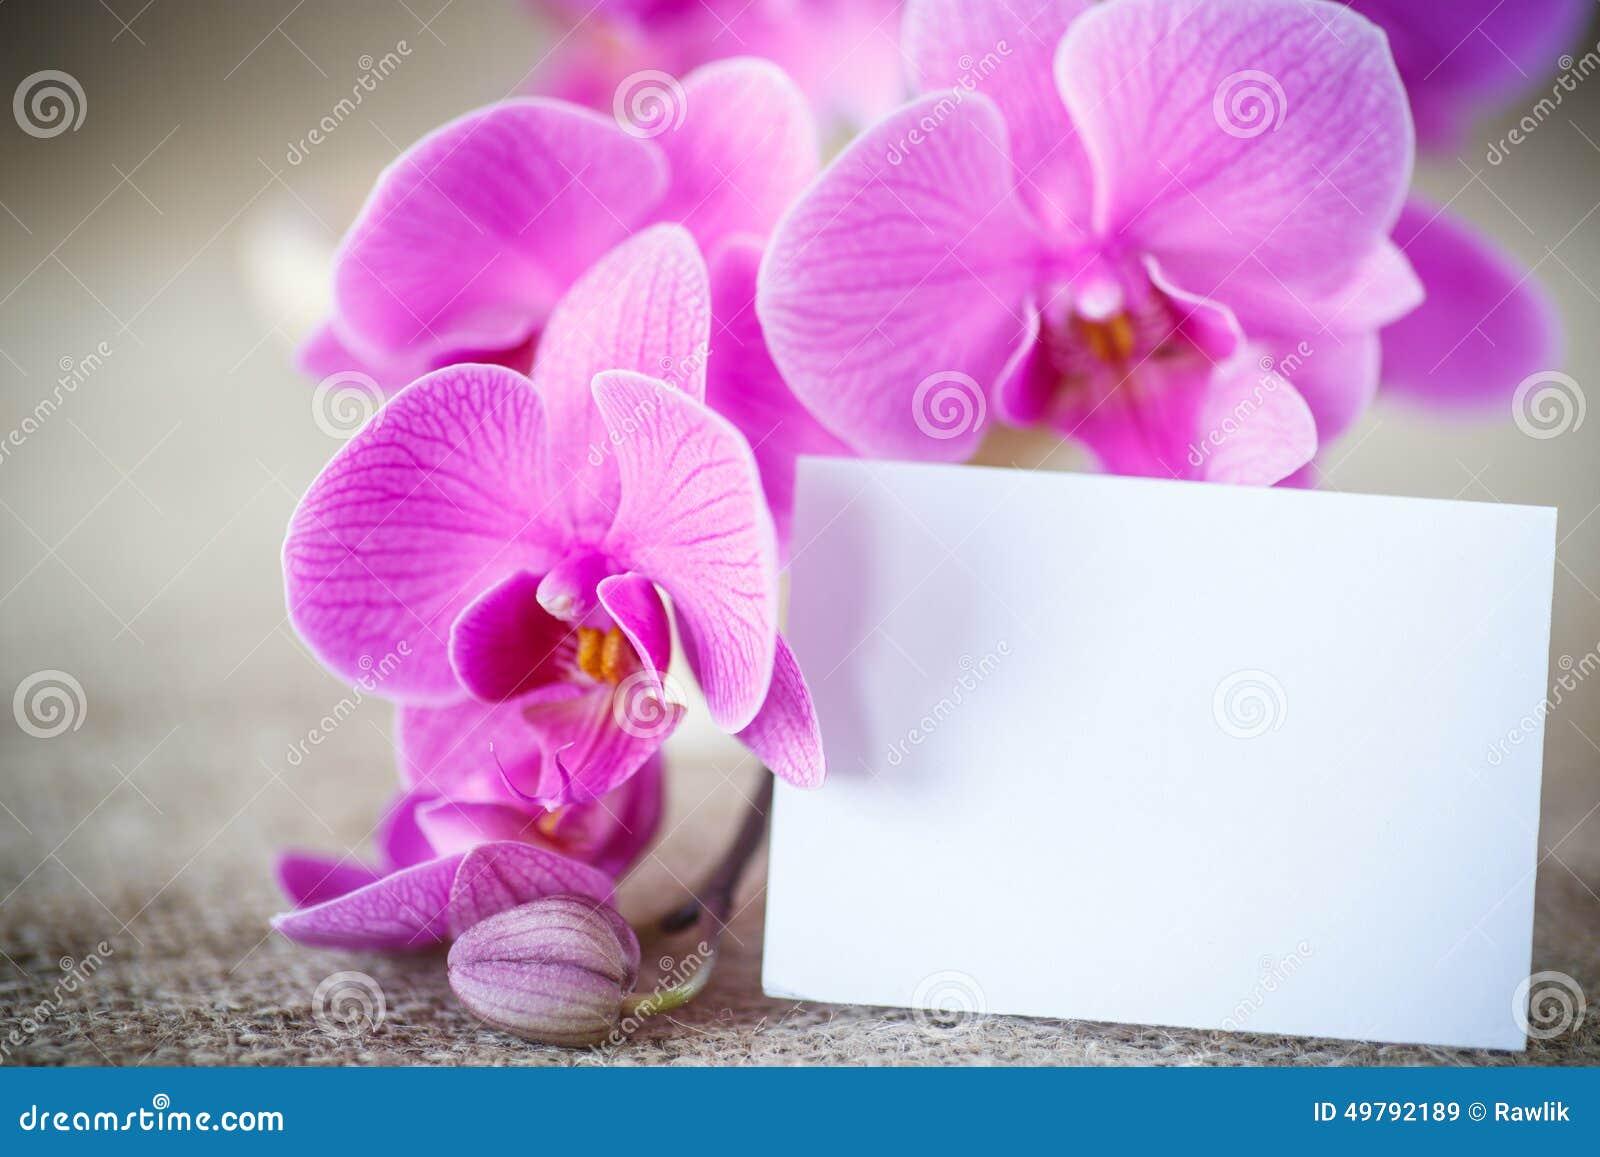 Beautiful Purple Phalaenopsis Flowers Stock Photo Image